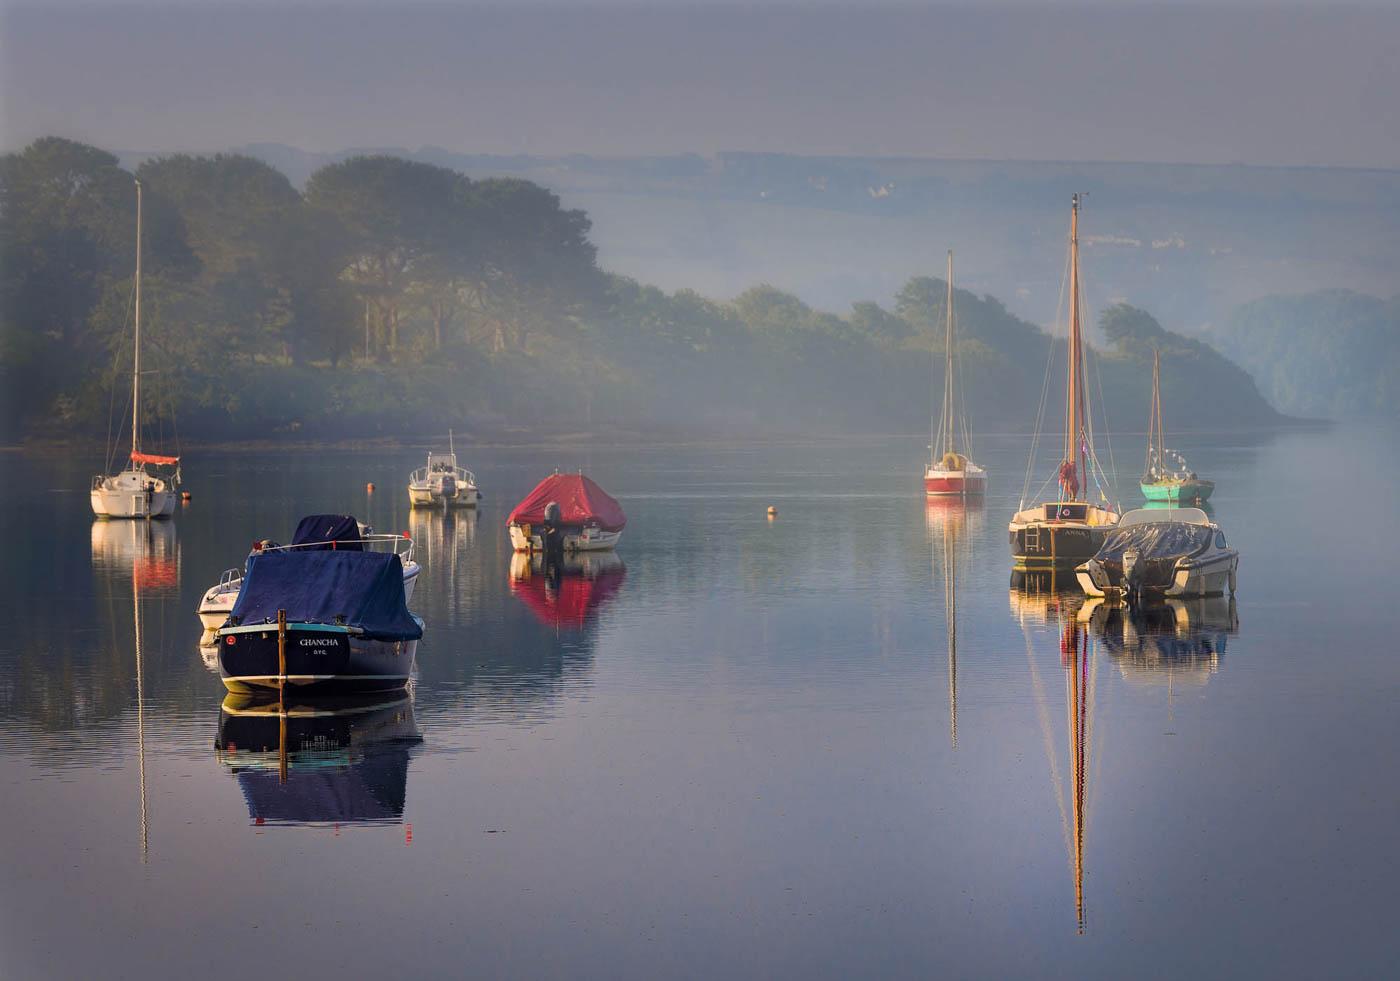 First 'Early Morning Peace' by John Barton